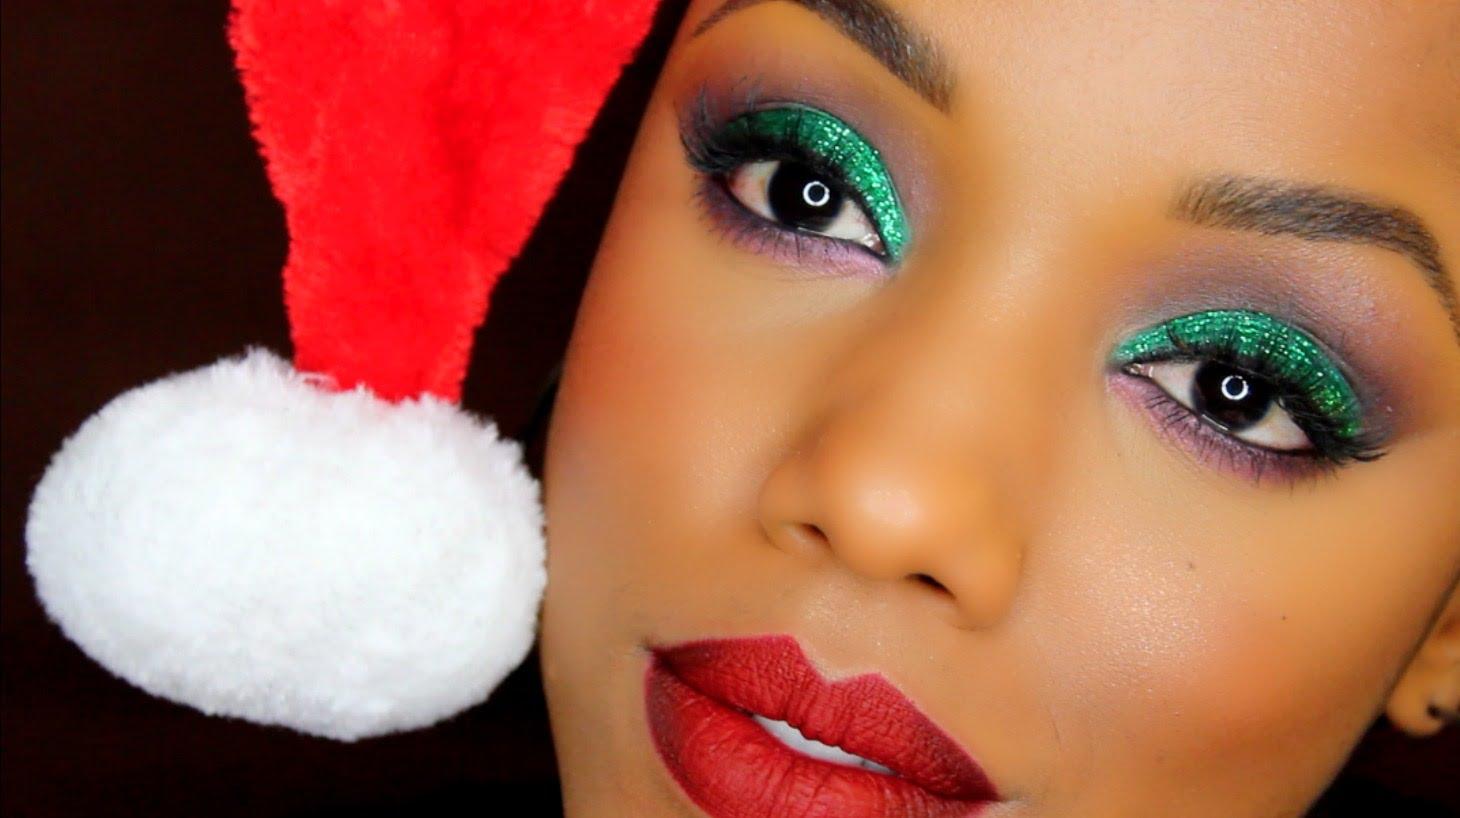 makeup tutorial, Christmas makeup ideas, New Year party, makeup ideas easy holiday makeup looks